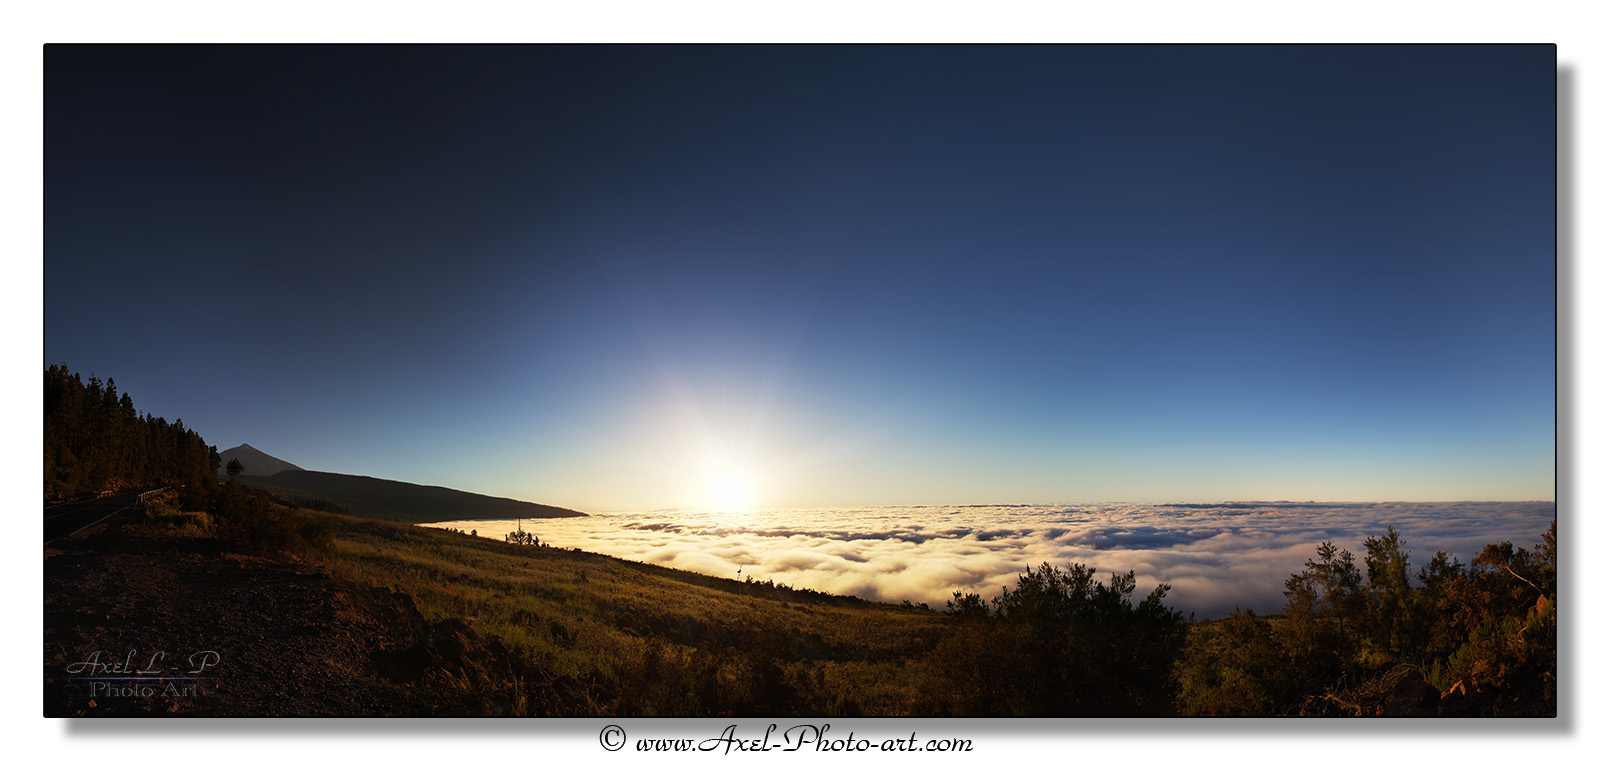 Panoramique au dessus des nuages